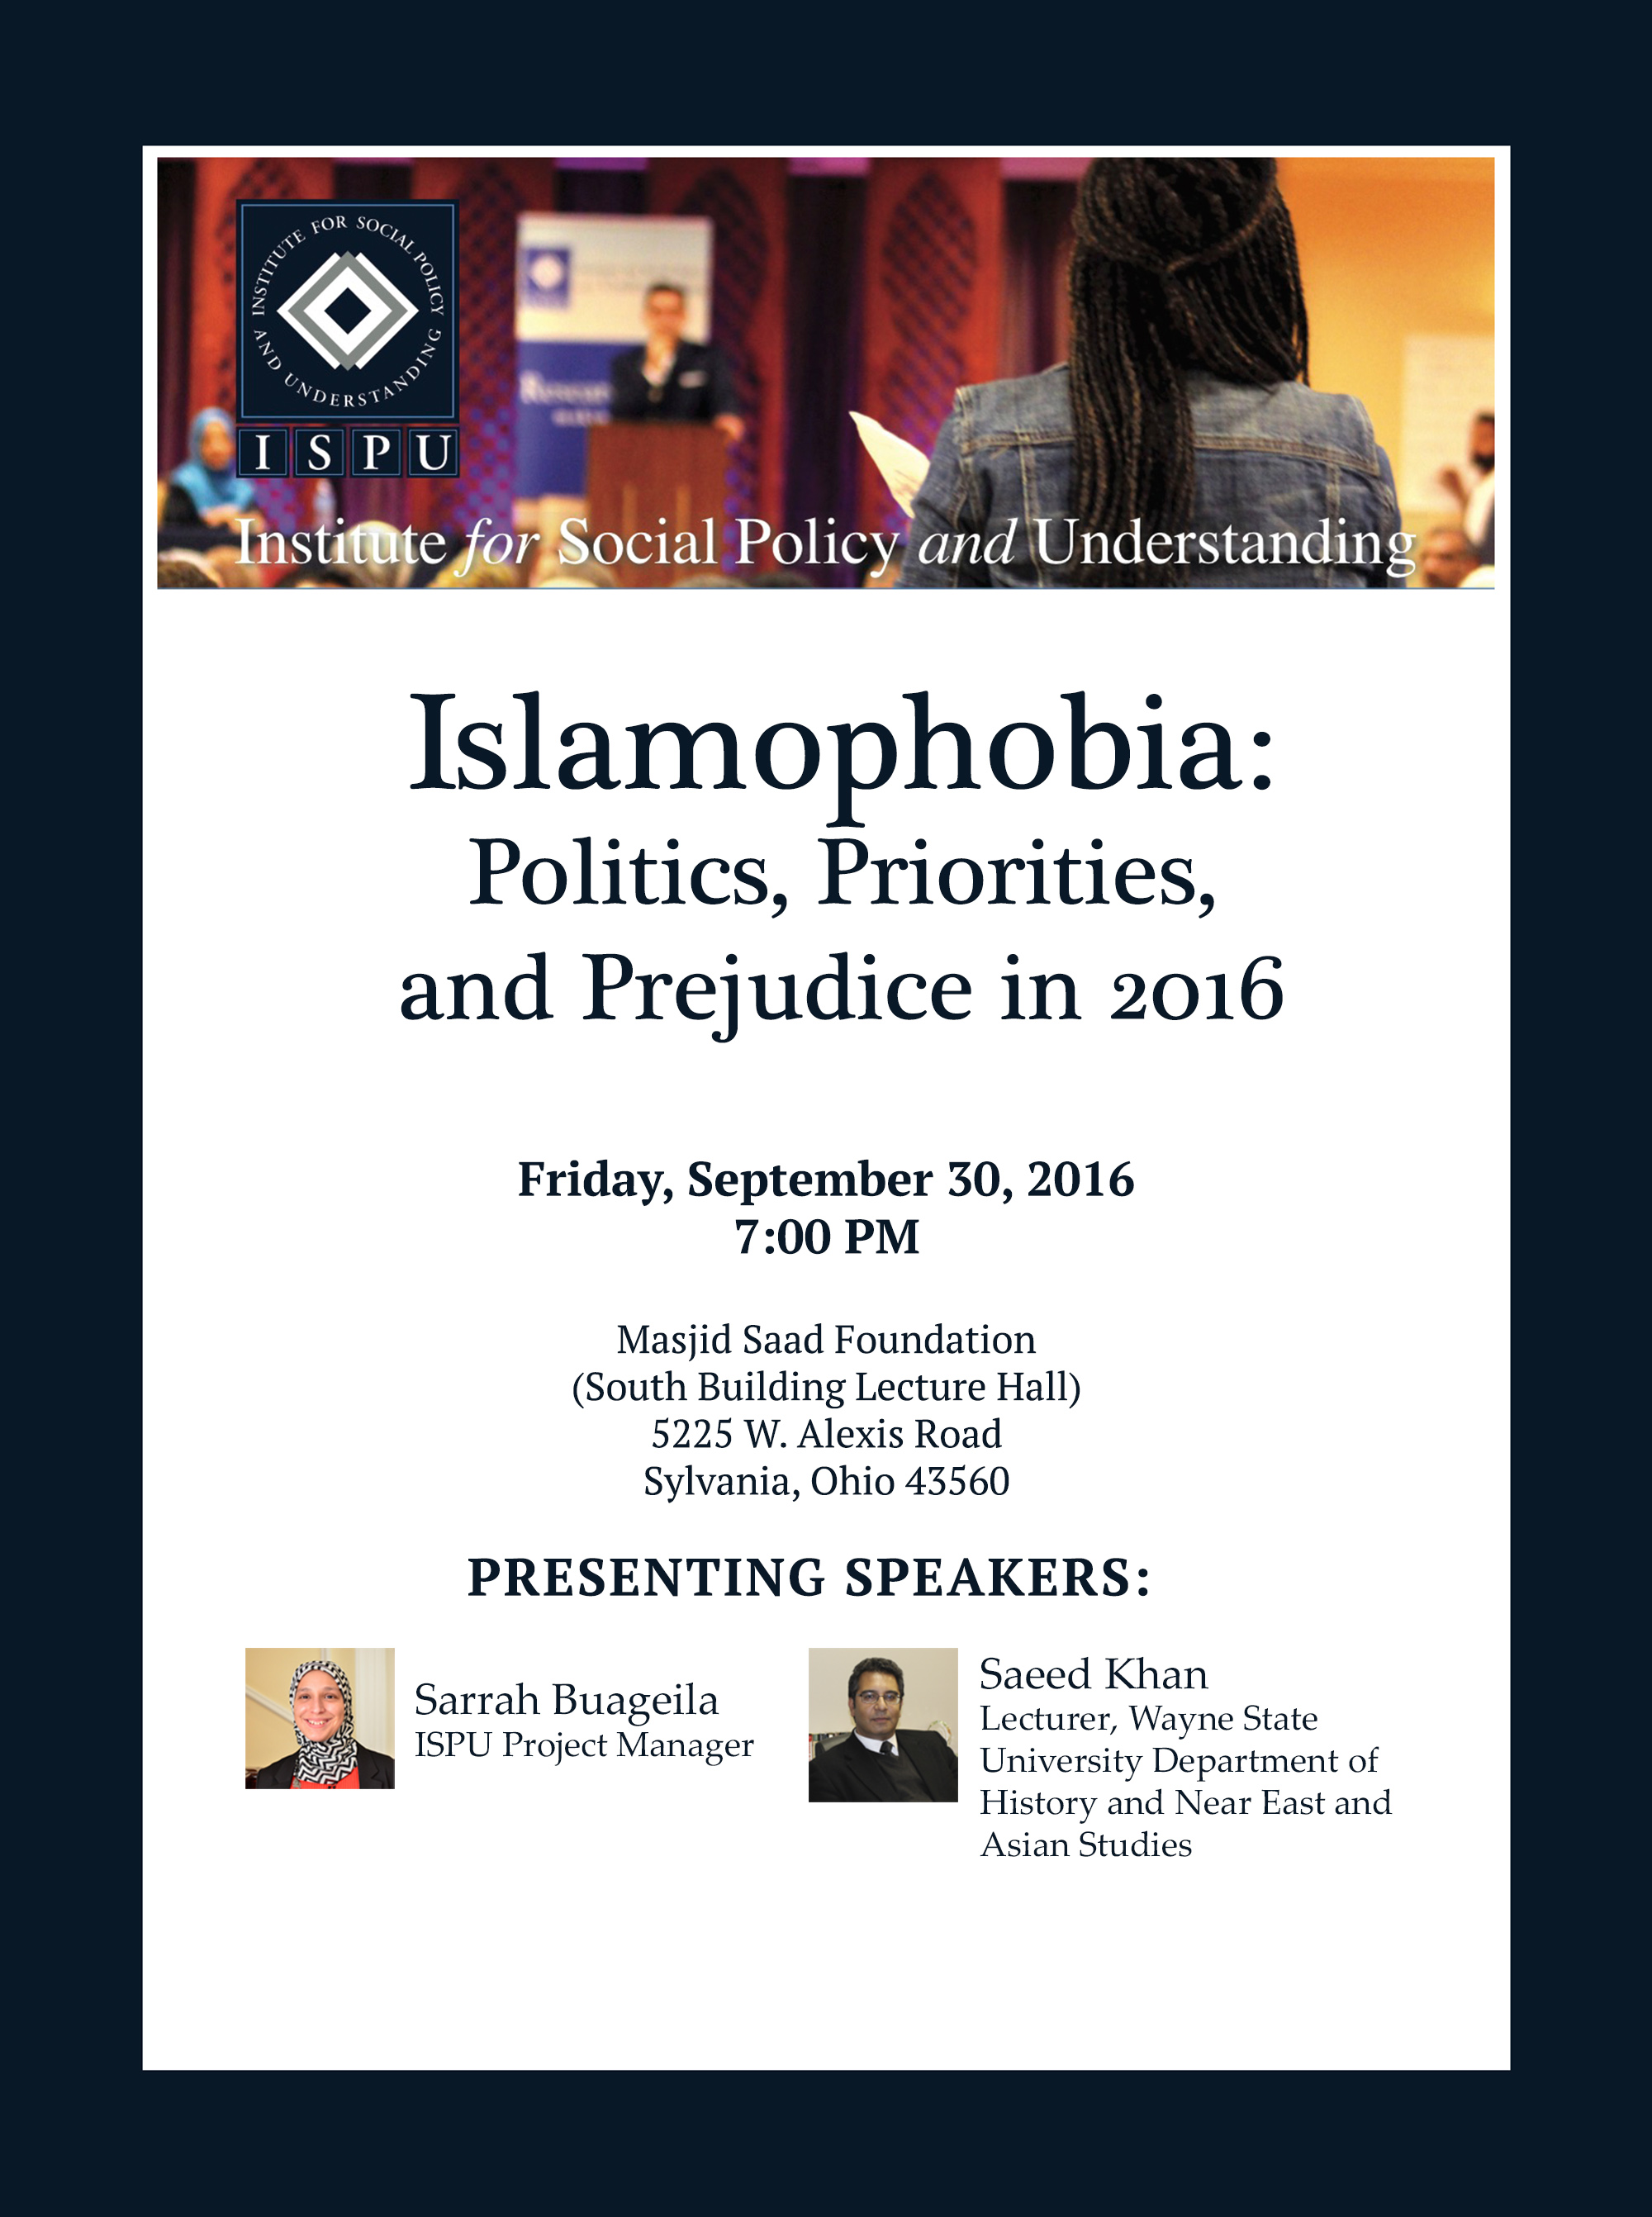 Islamophobia: Politics, Priorities, and Prejudice in 2016 -- Toledo